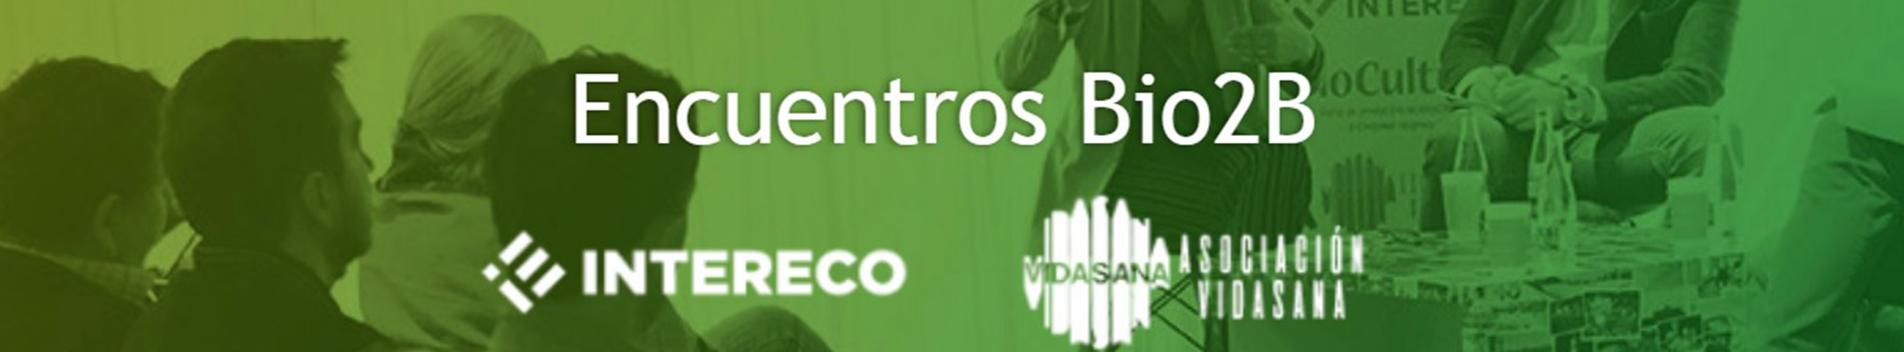 VidaSana e INTERECO organizan Encuentros Profesionales BIO2B